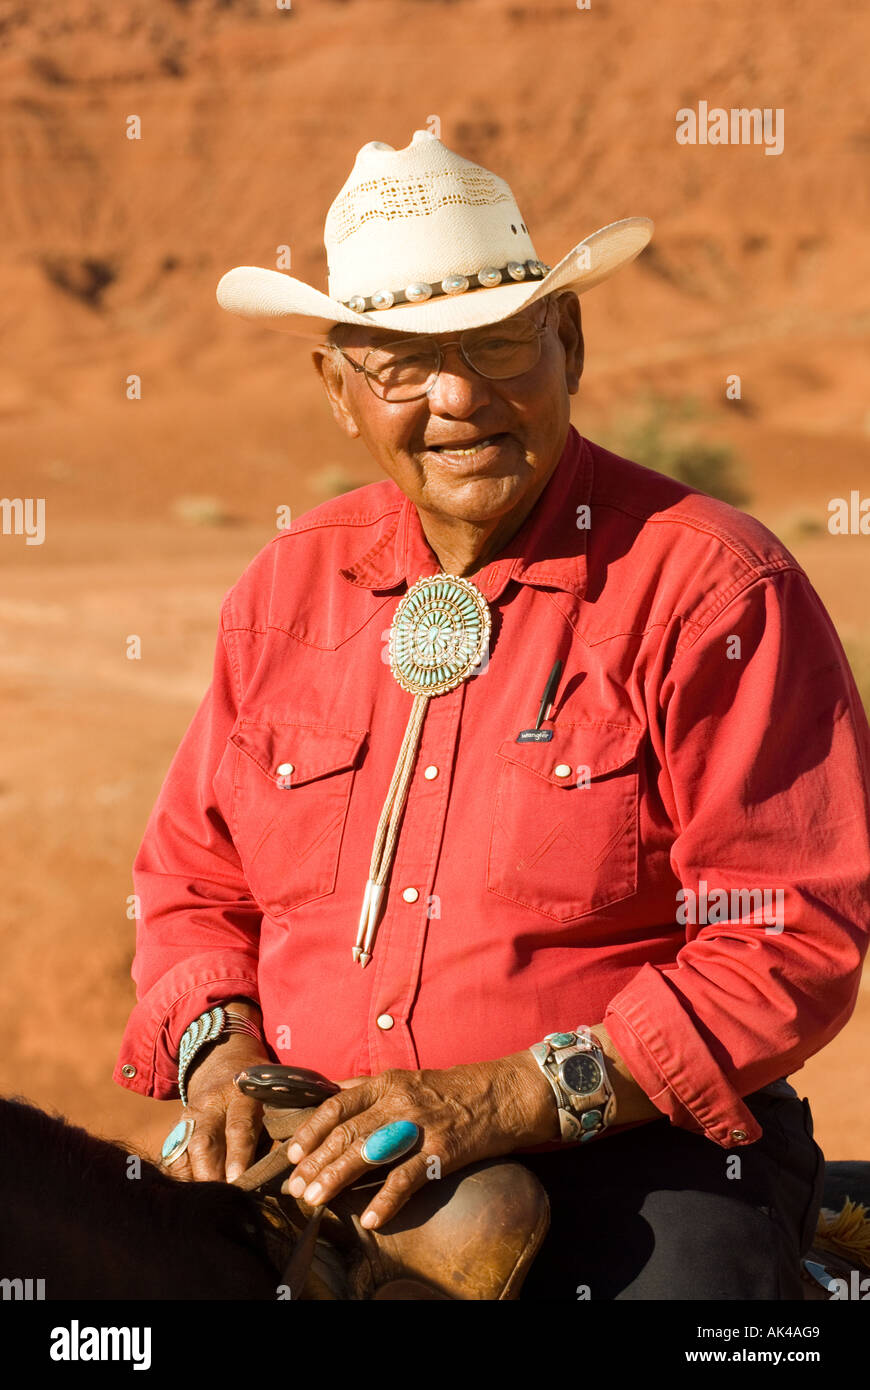 b06febfe3a482 ARIZONA MONUMENT VALLEY TRIBAL PARK NATIVE AMERICAN Navajo cowboy on horse  wearing Turqoise Jewlery and straw